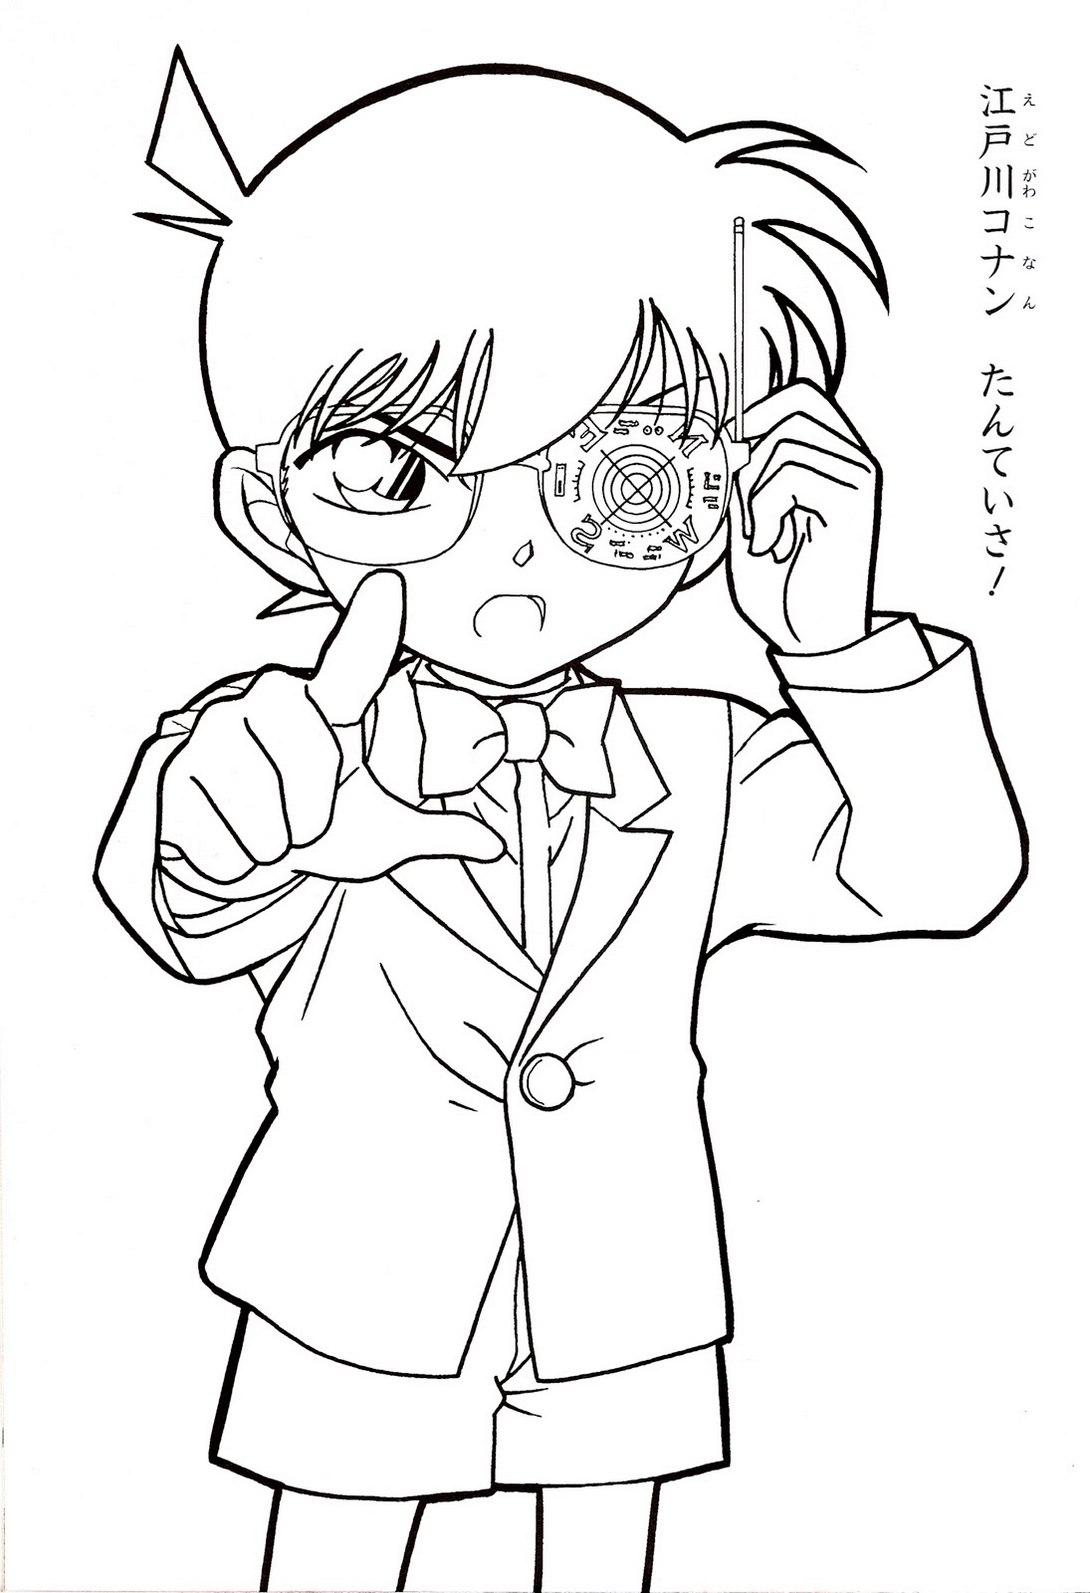 Conan_in_action_coloring_sheet